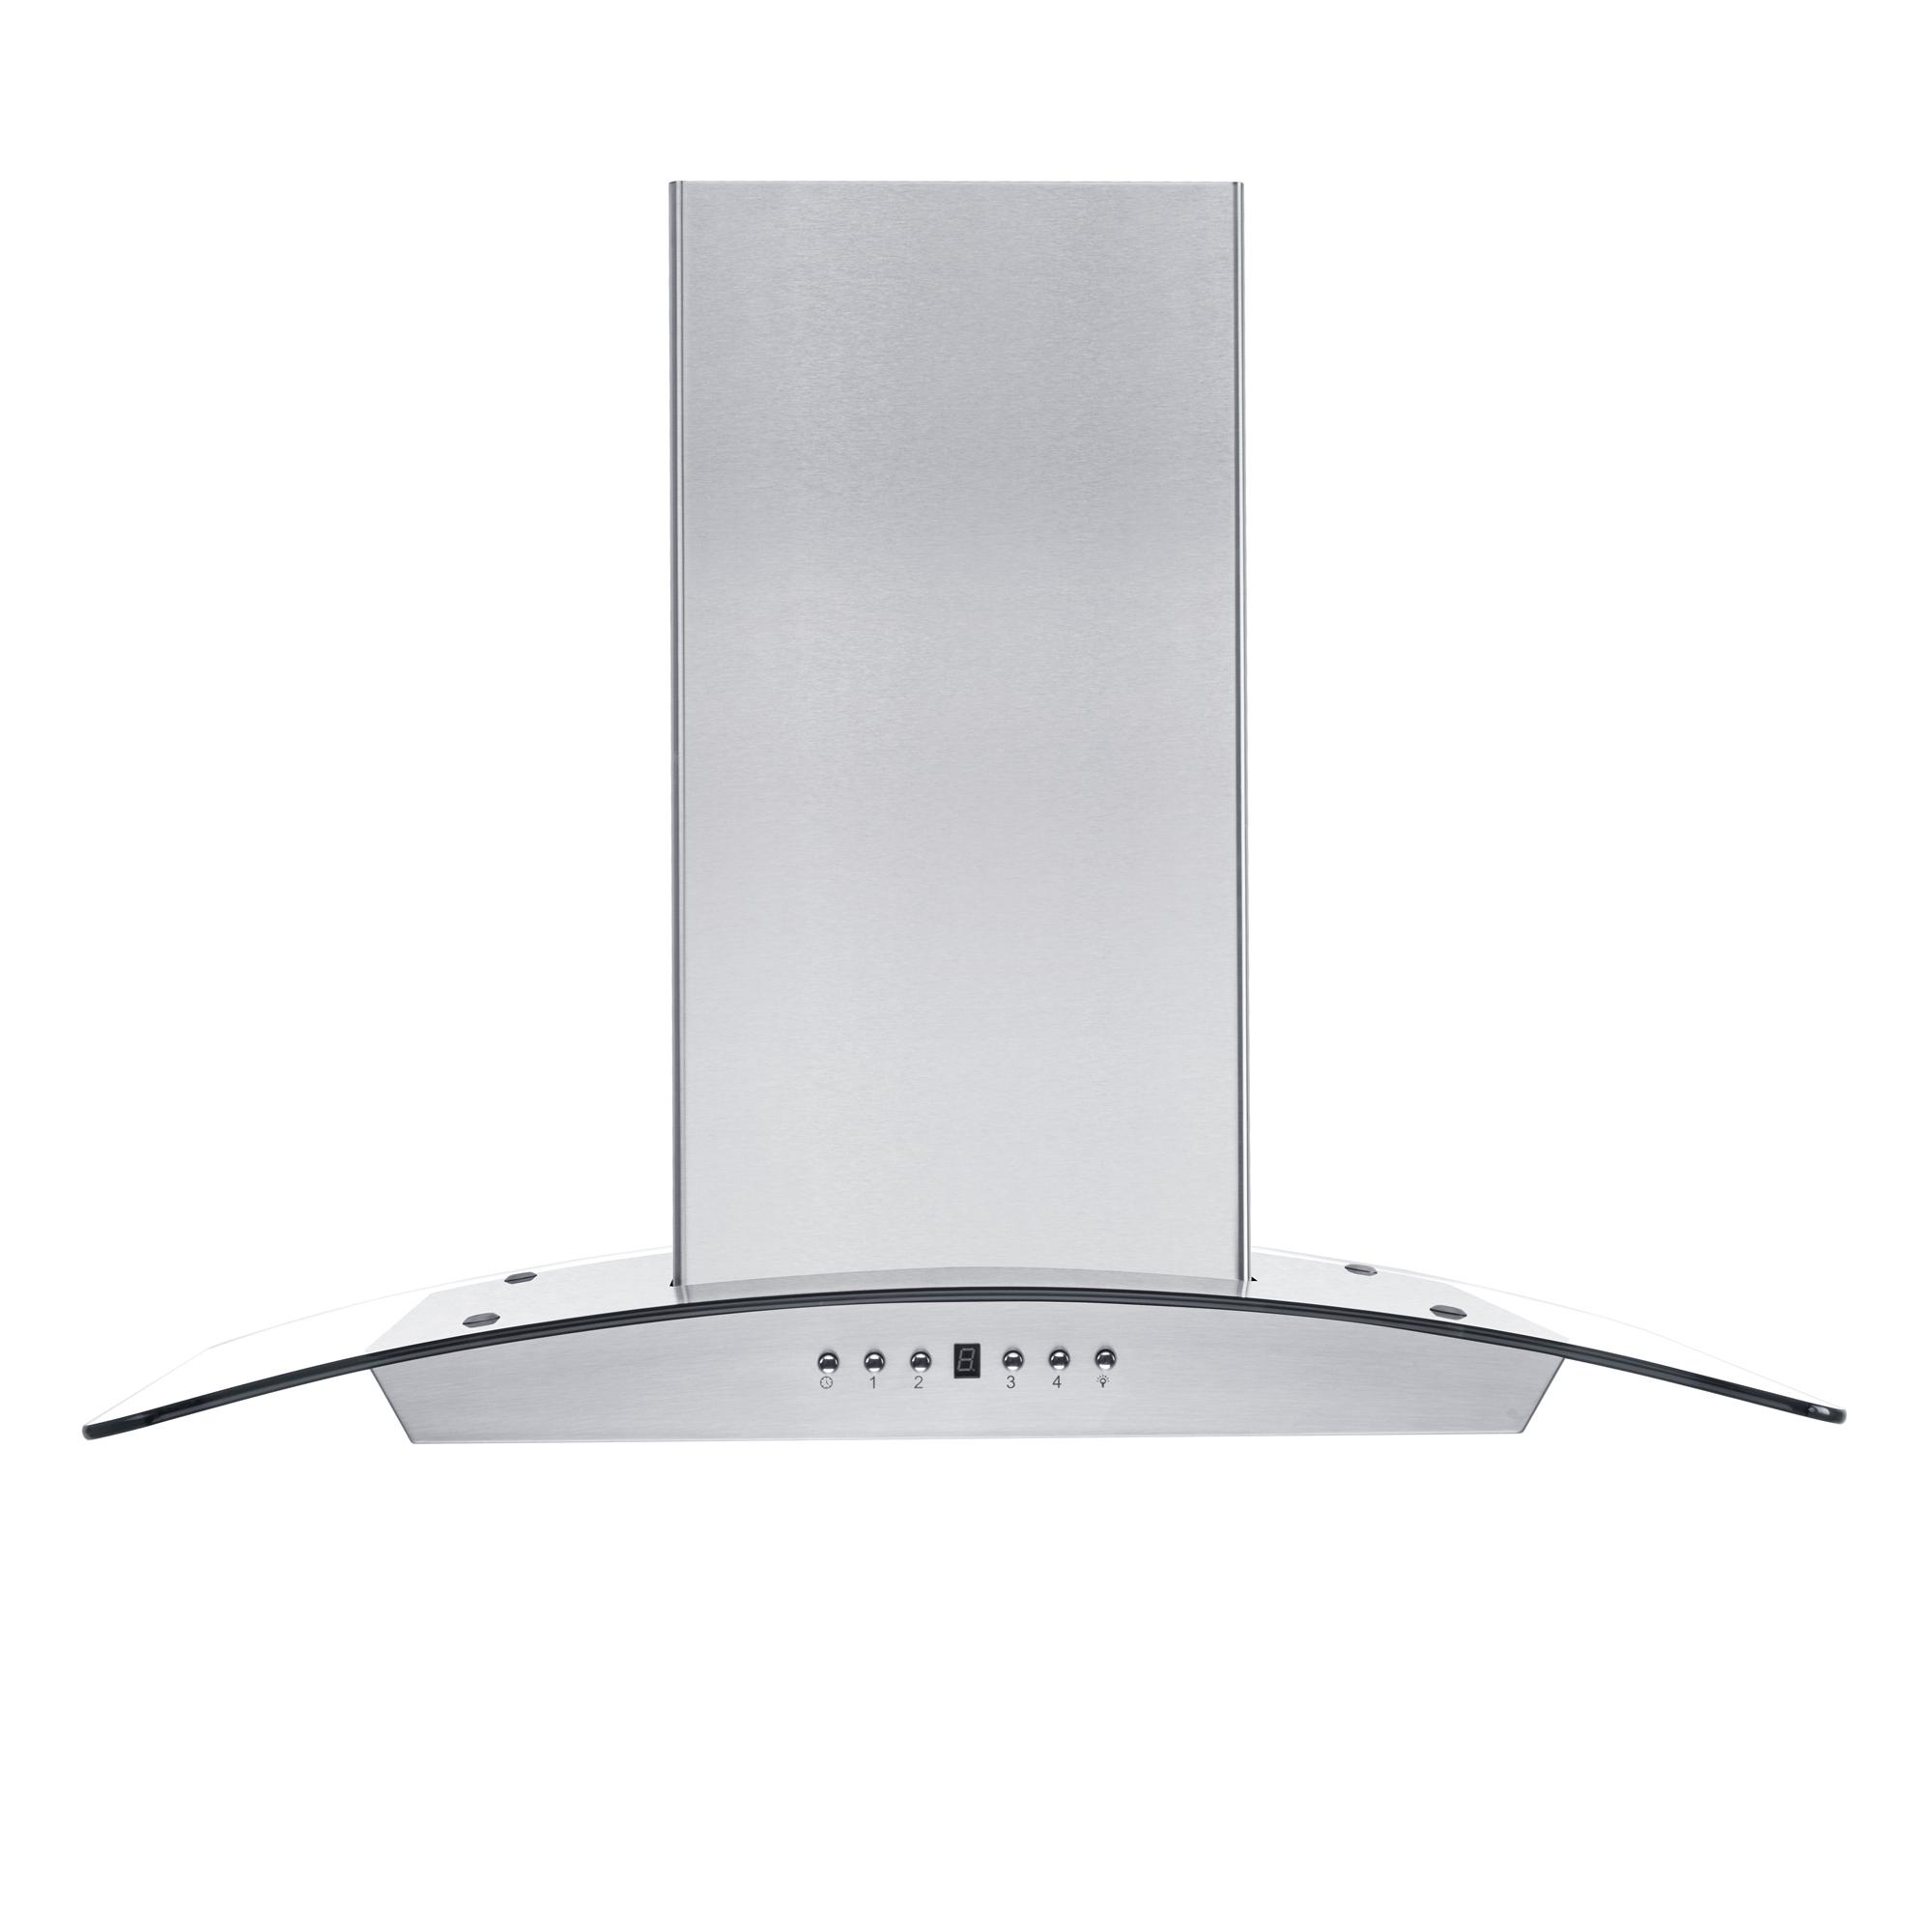 zline-stainless-steel-wall-mounted-range-hood-KZ-new-front.jpg